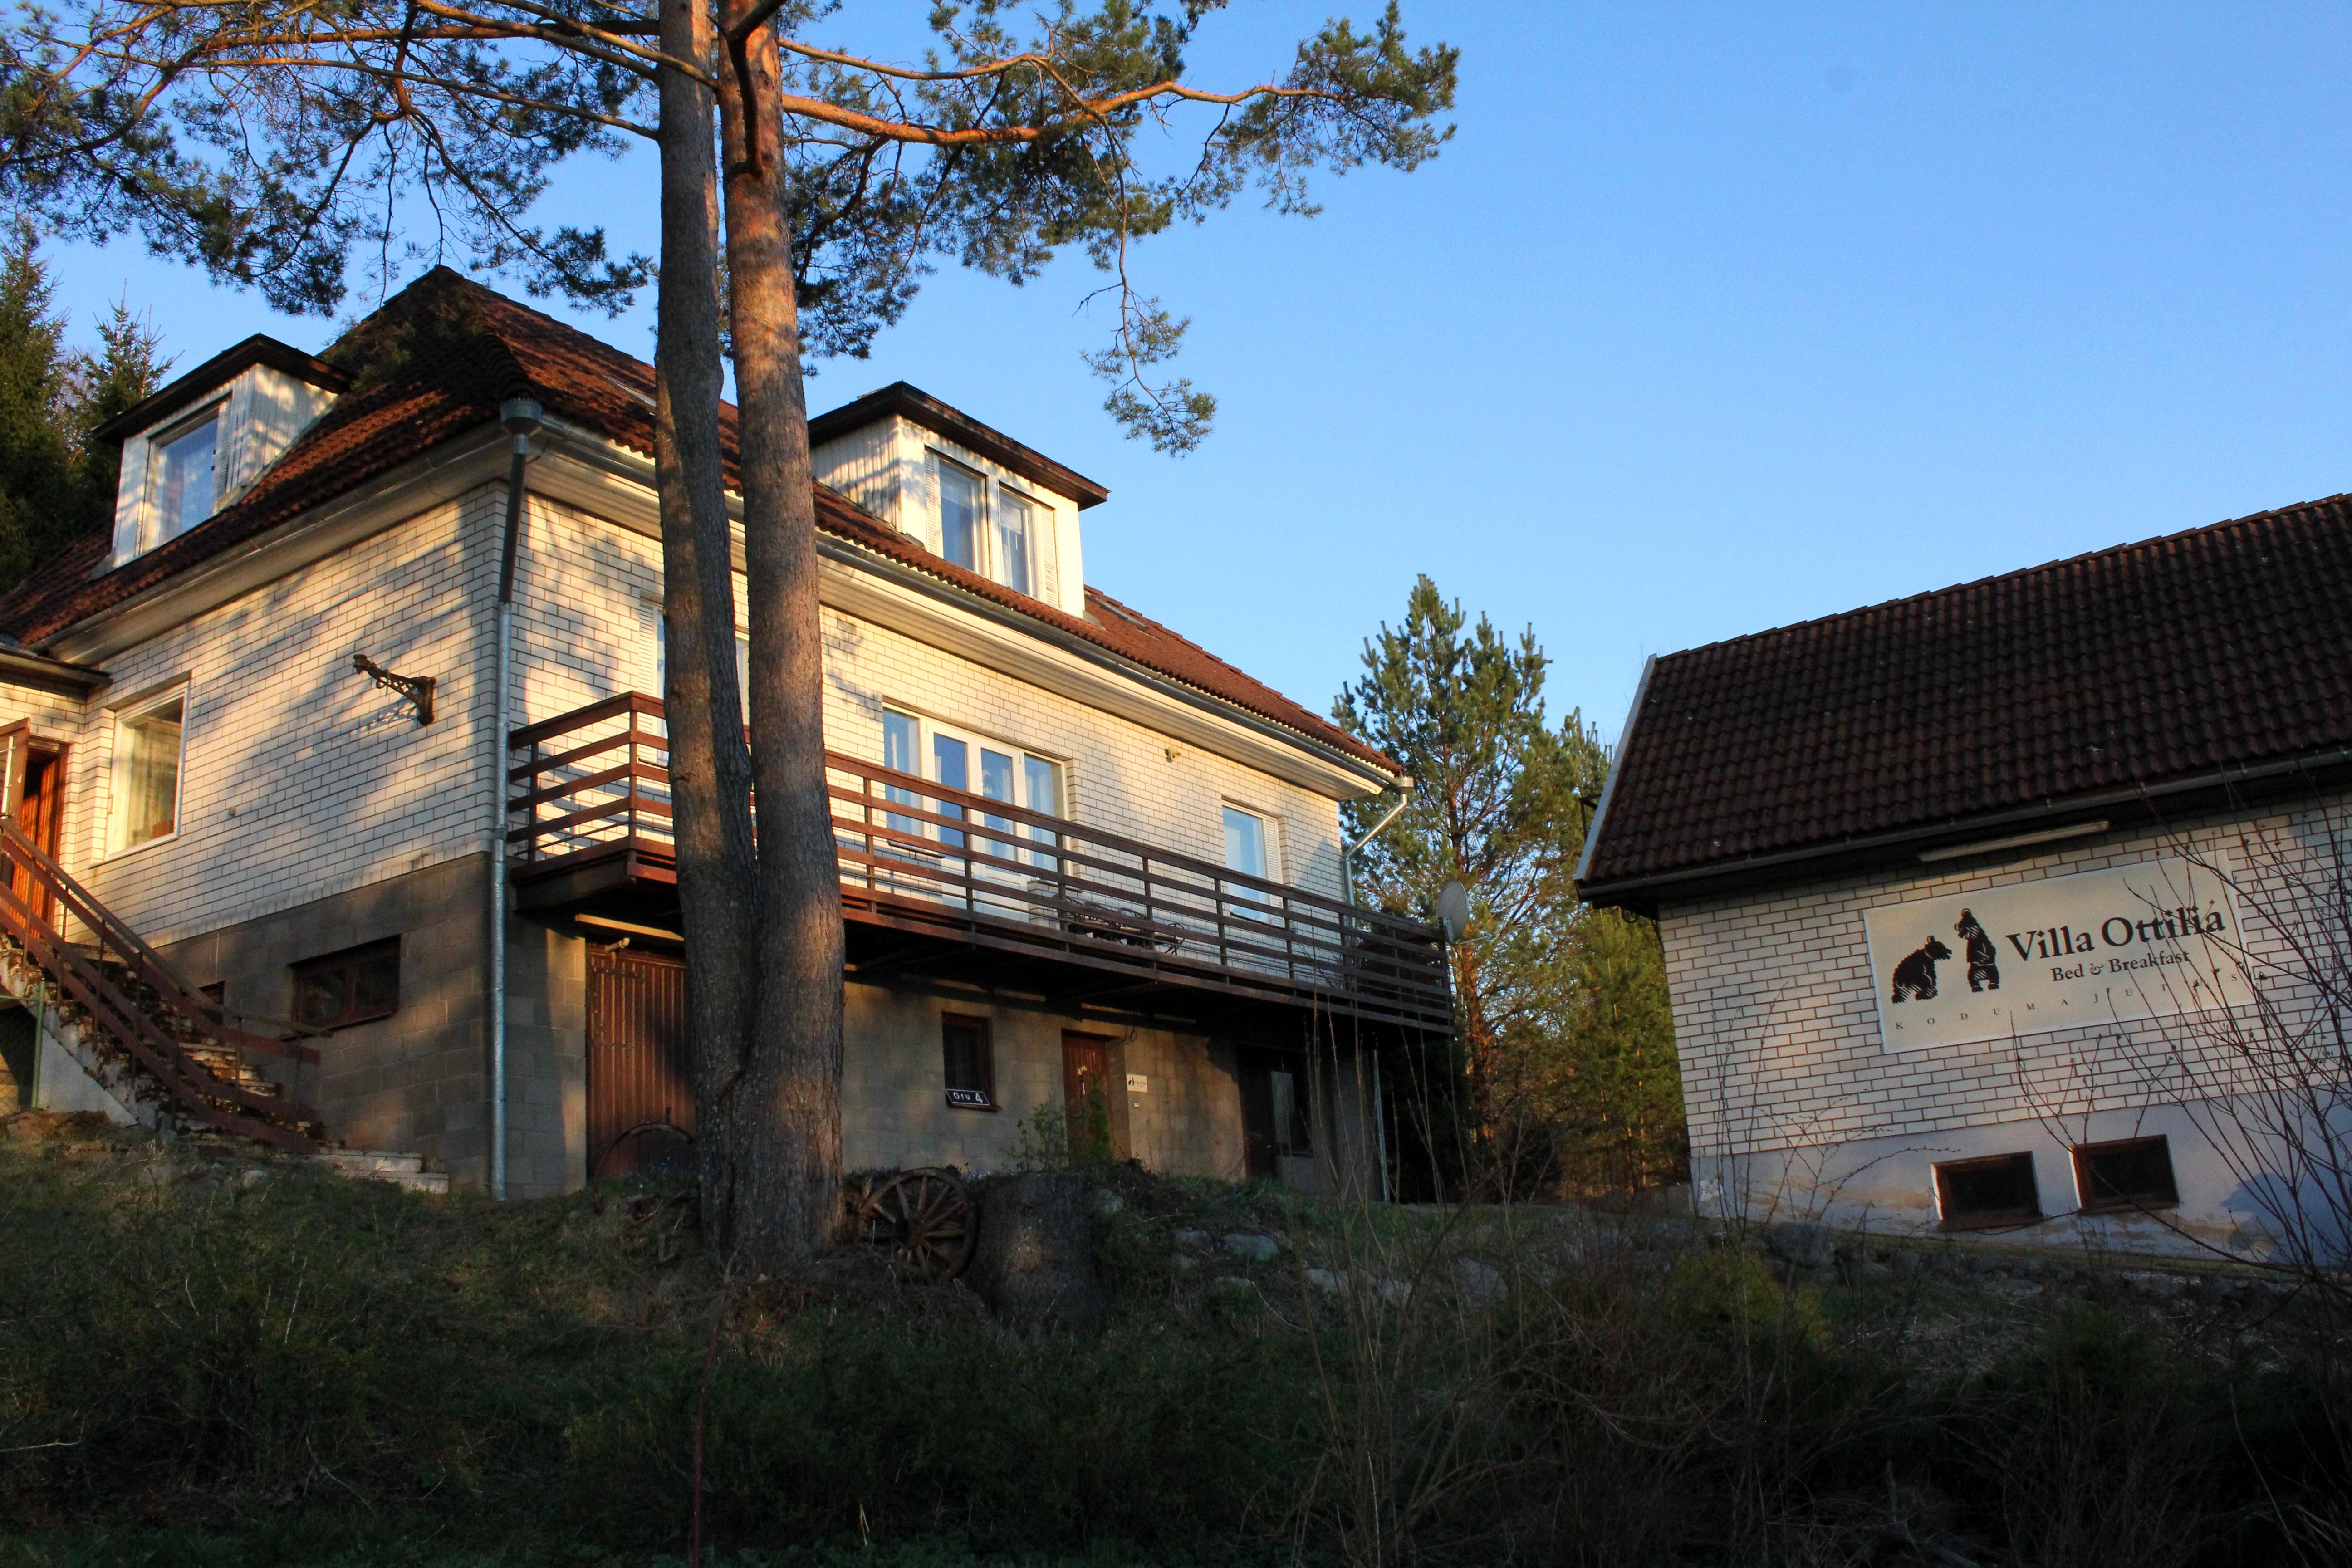 villa-ottilia